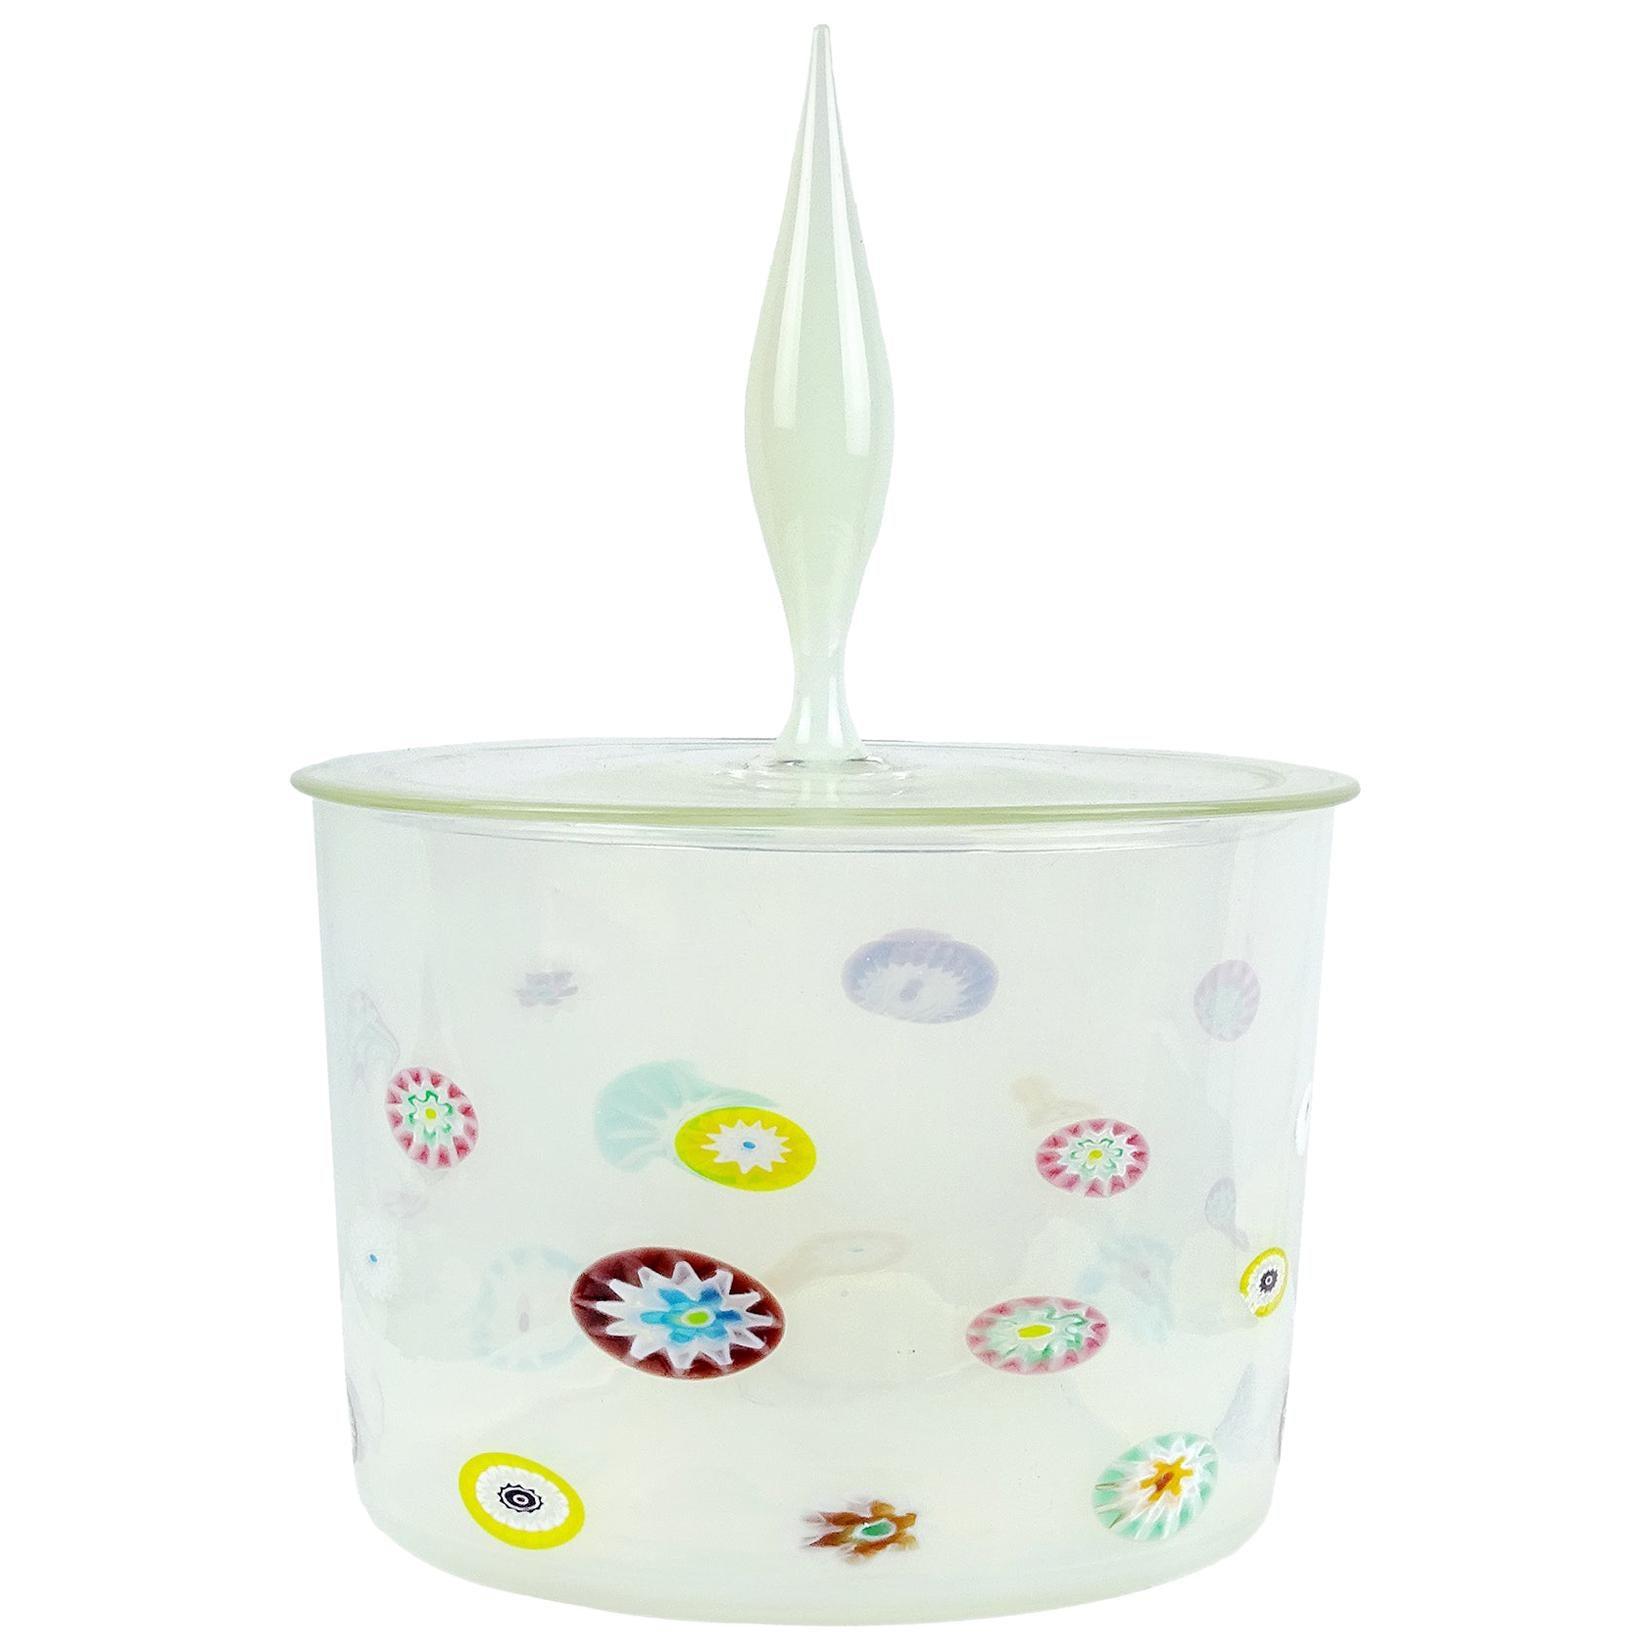 Fratelli Toso Murano White Opalescent Flower Murrine Italian Art Glass Jar